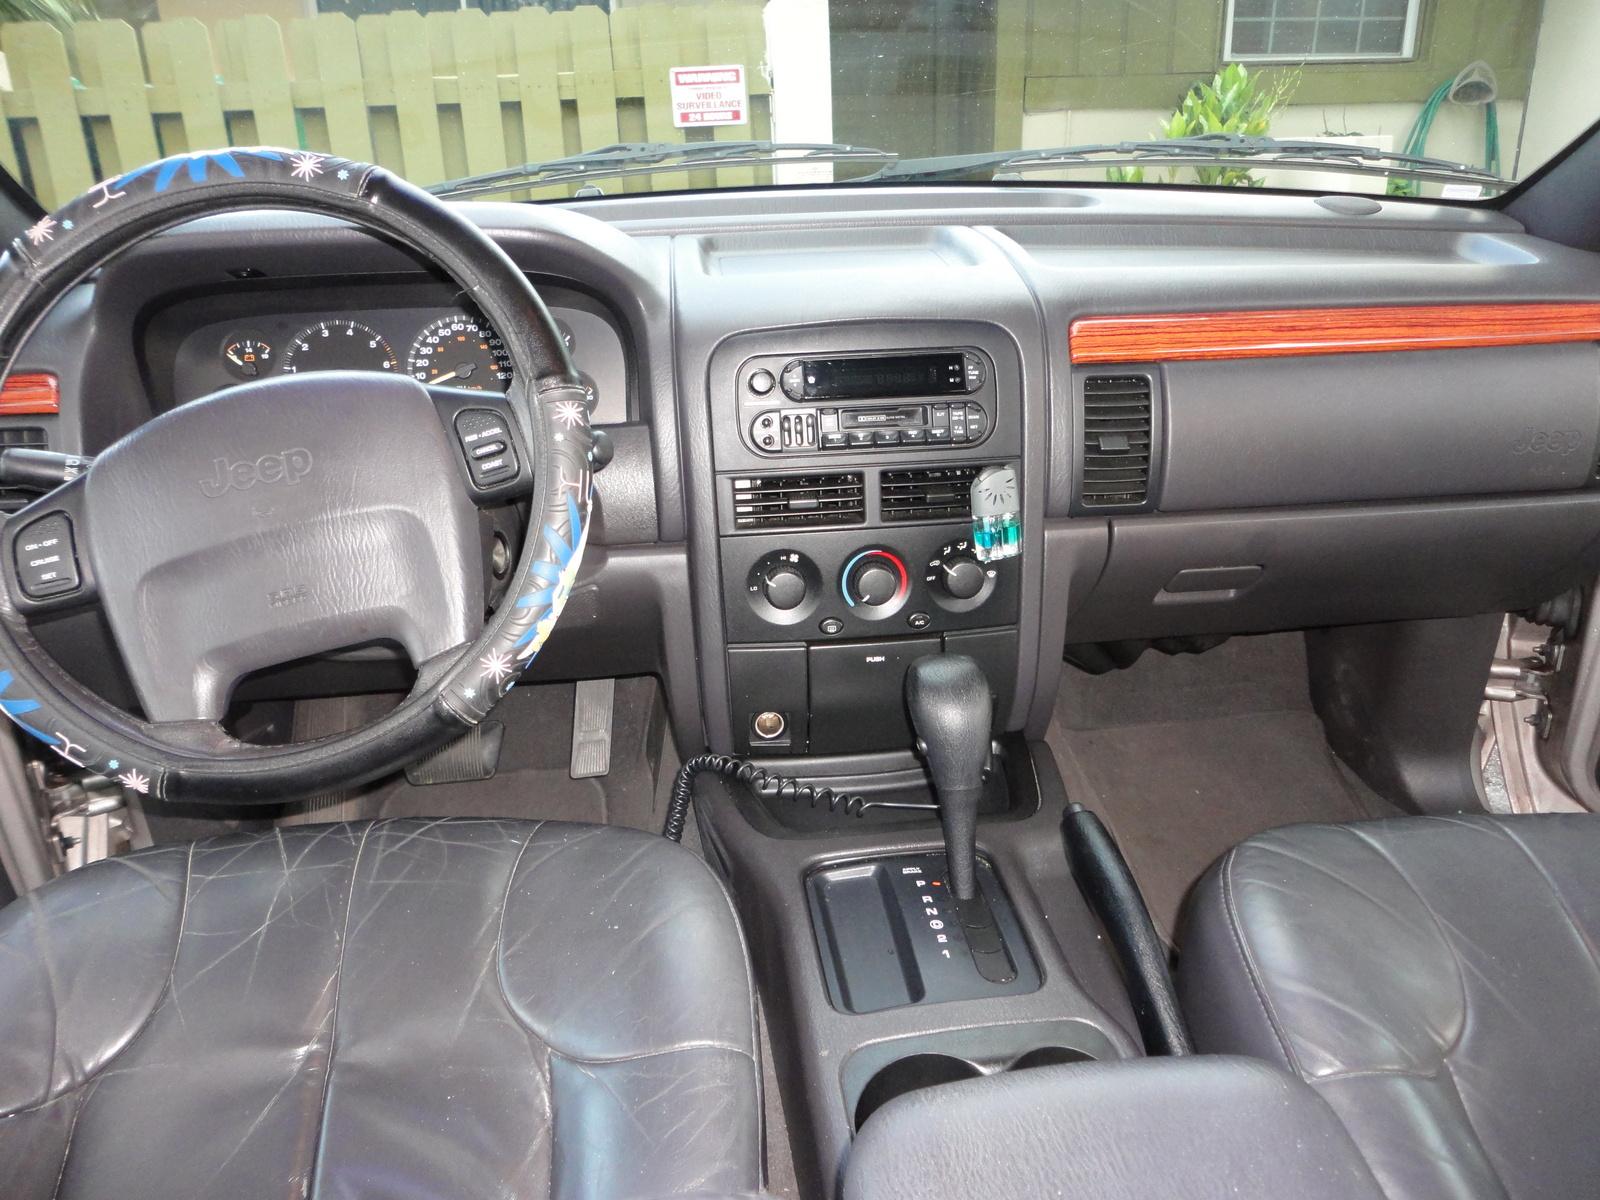 1999 jeep grand cherokee pictures cargurus - Jeep grand cherokee laredo interior ...